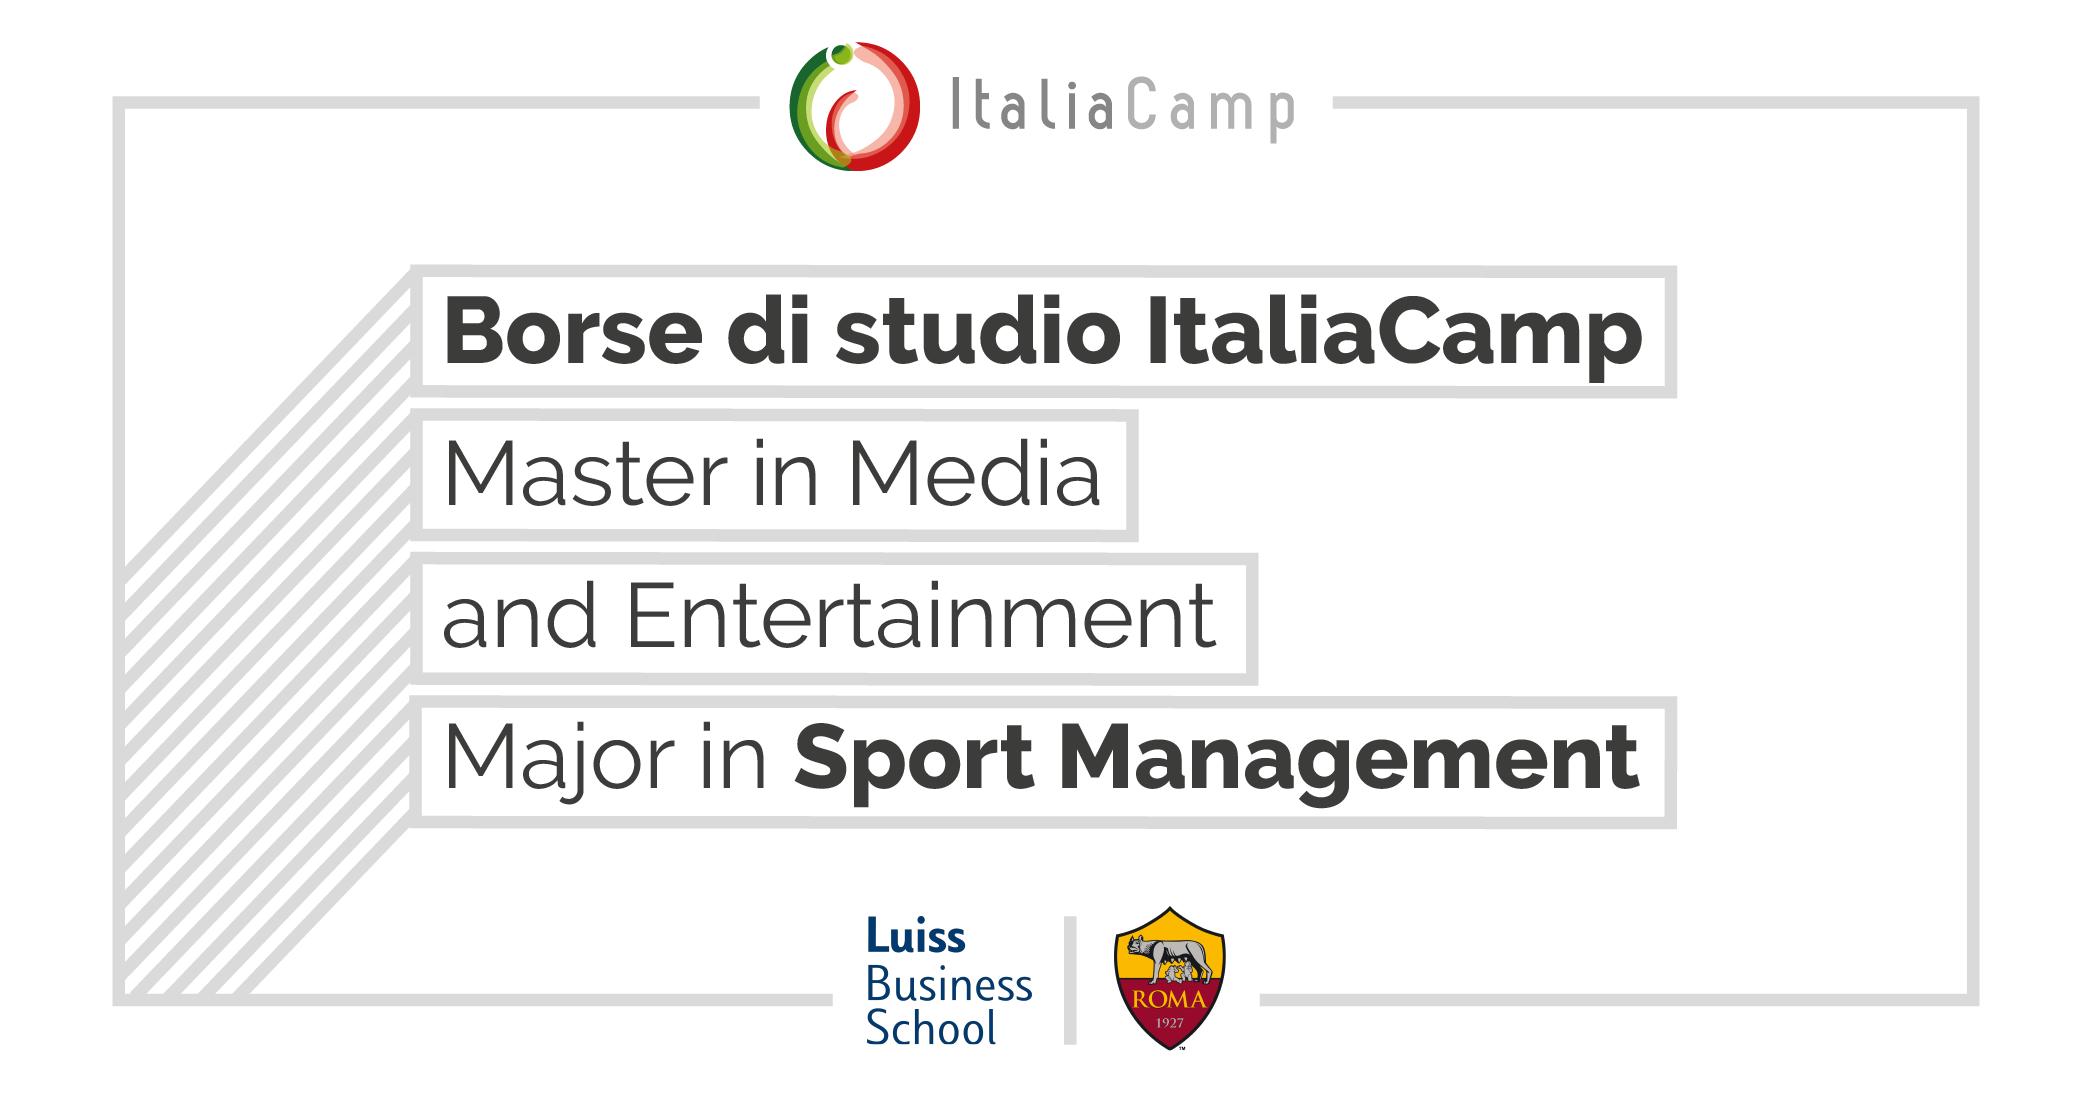 ItaliaCamp borse di studio major sport management